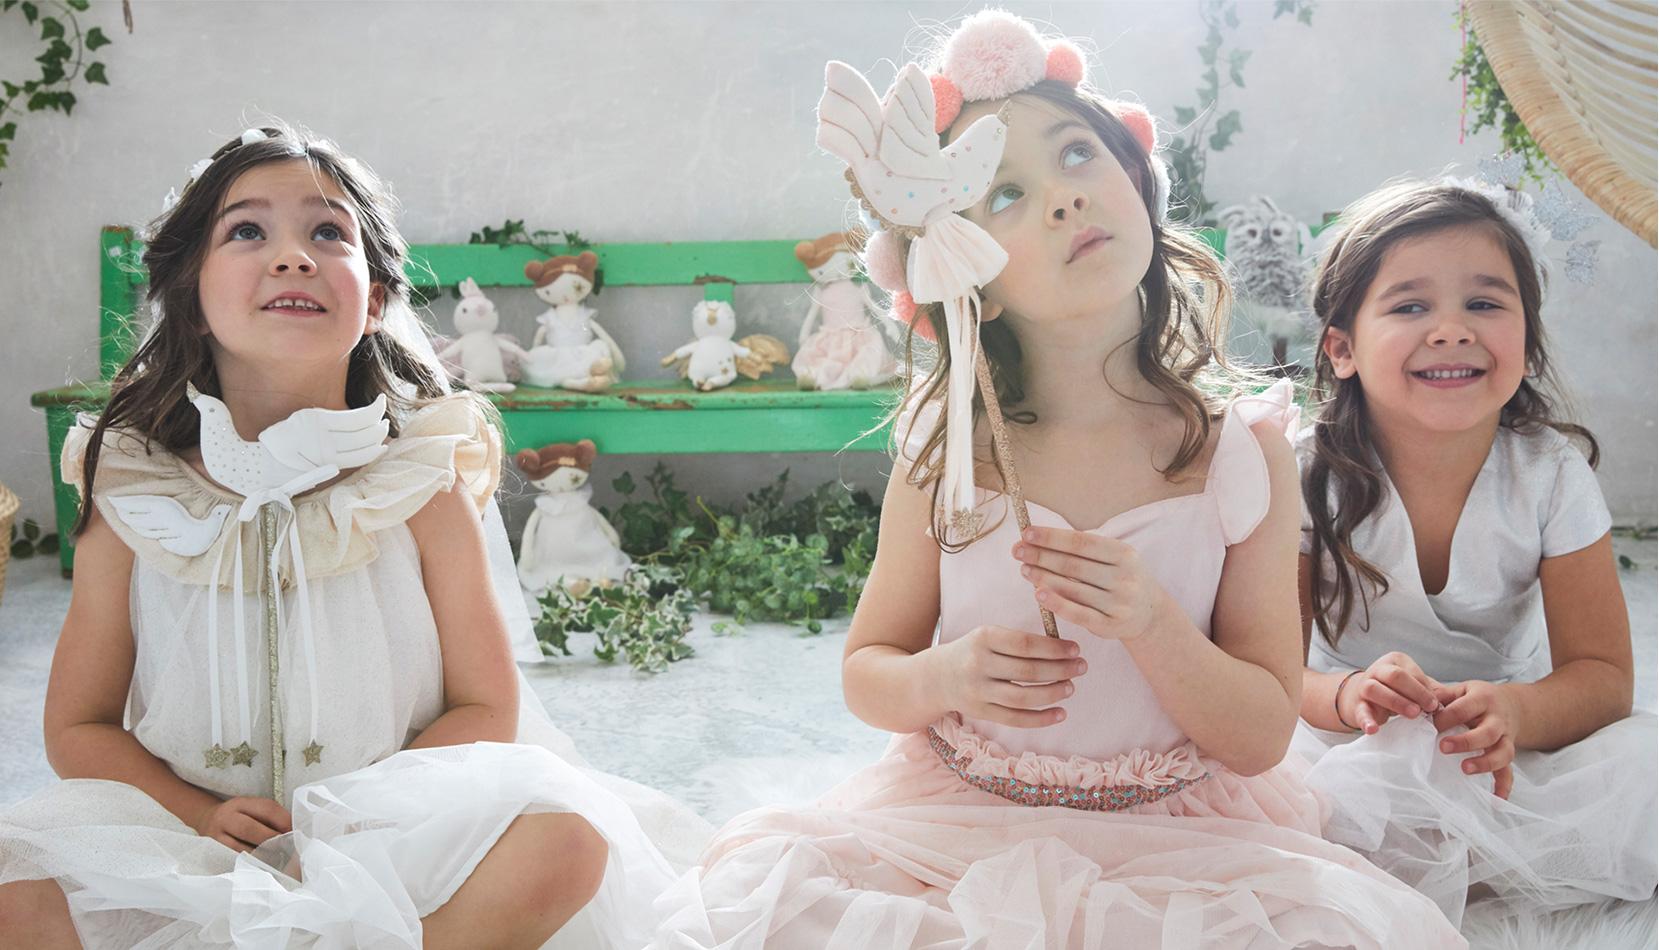 TAO dream: The lookbook for our princesses! | Tape à l'œil